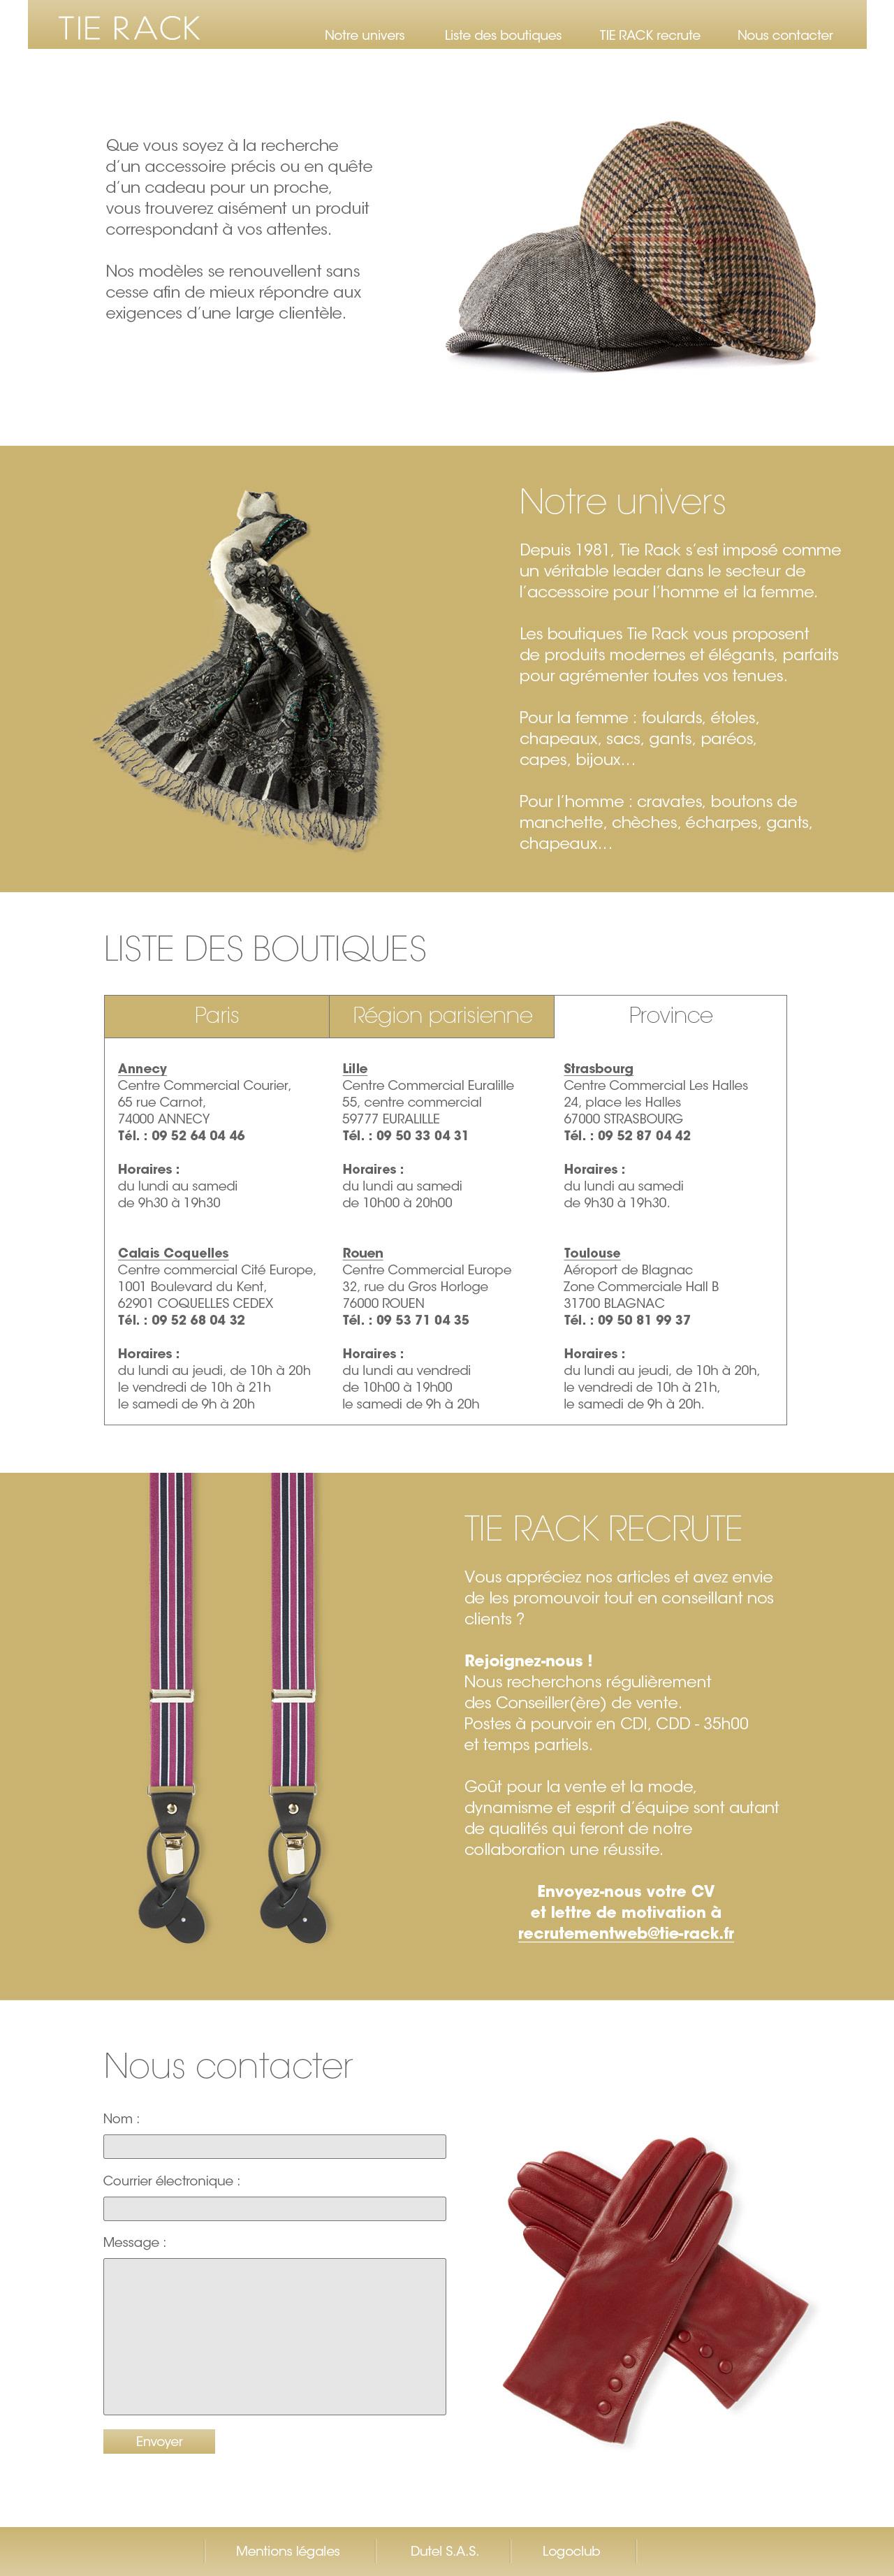 Alexandre Graindorge - Senior Designer - Tie Rack France Website